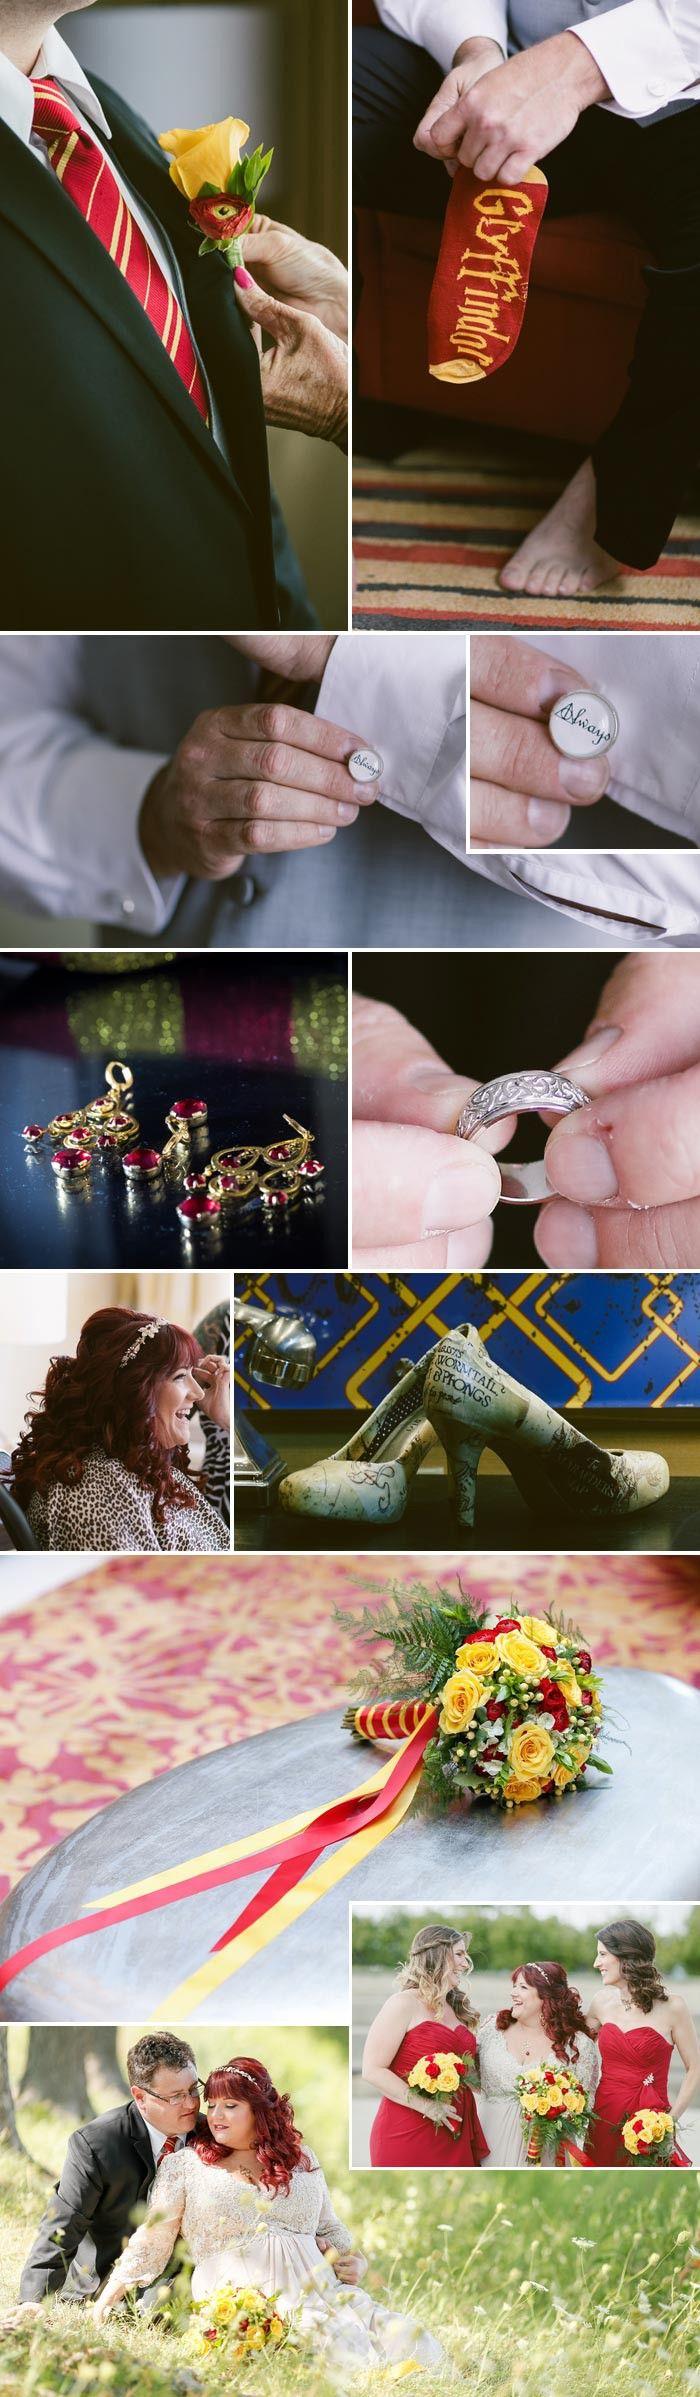 Harry Potter Hochzeit: Das Getting Ready © sachi villareal imaging llc